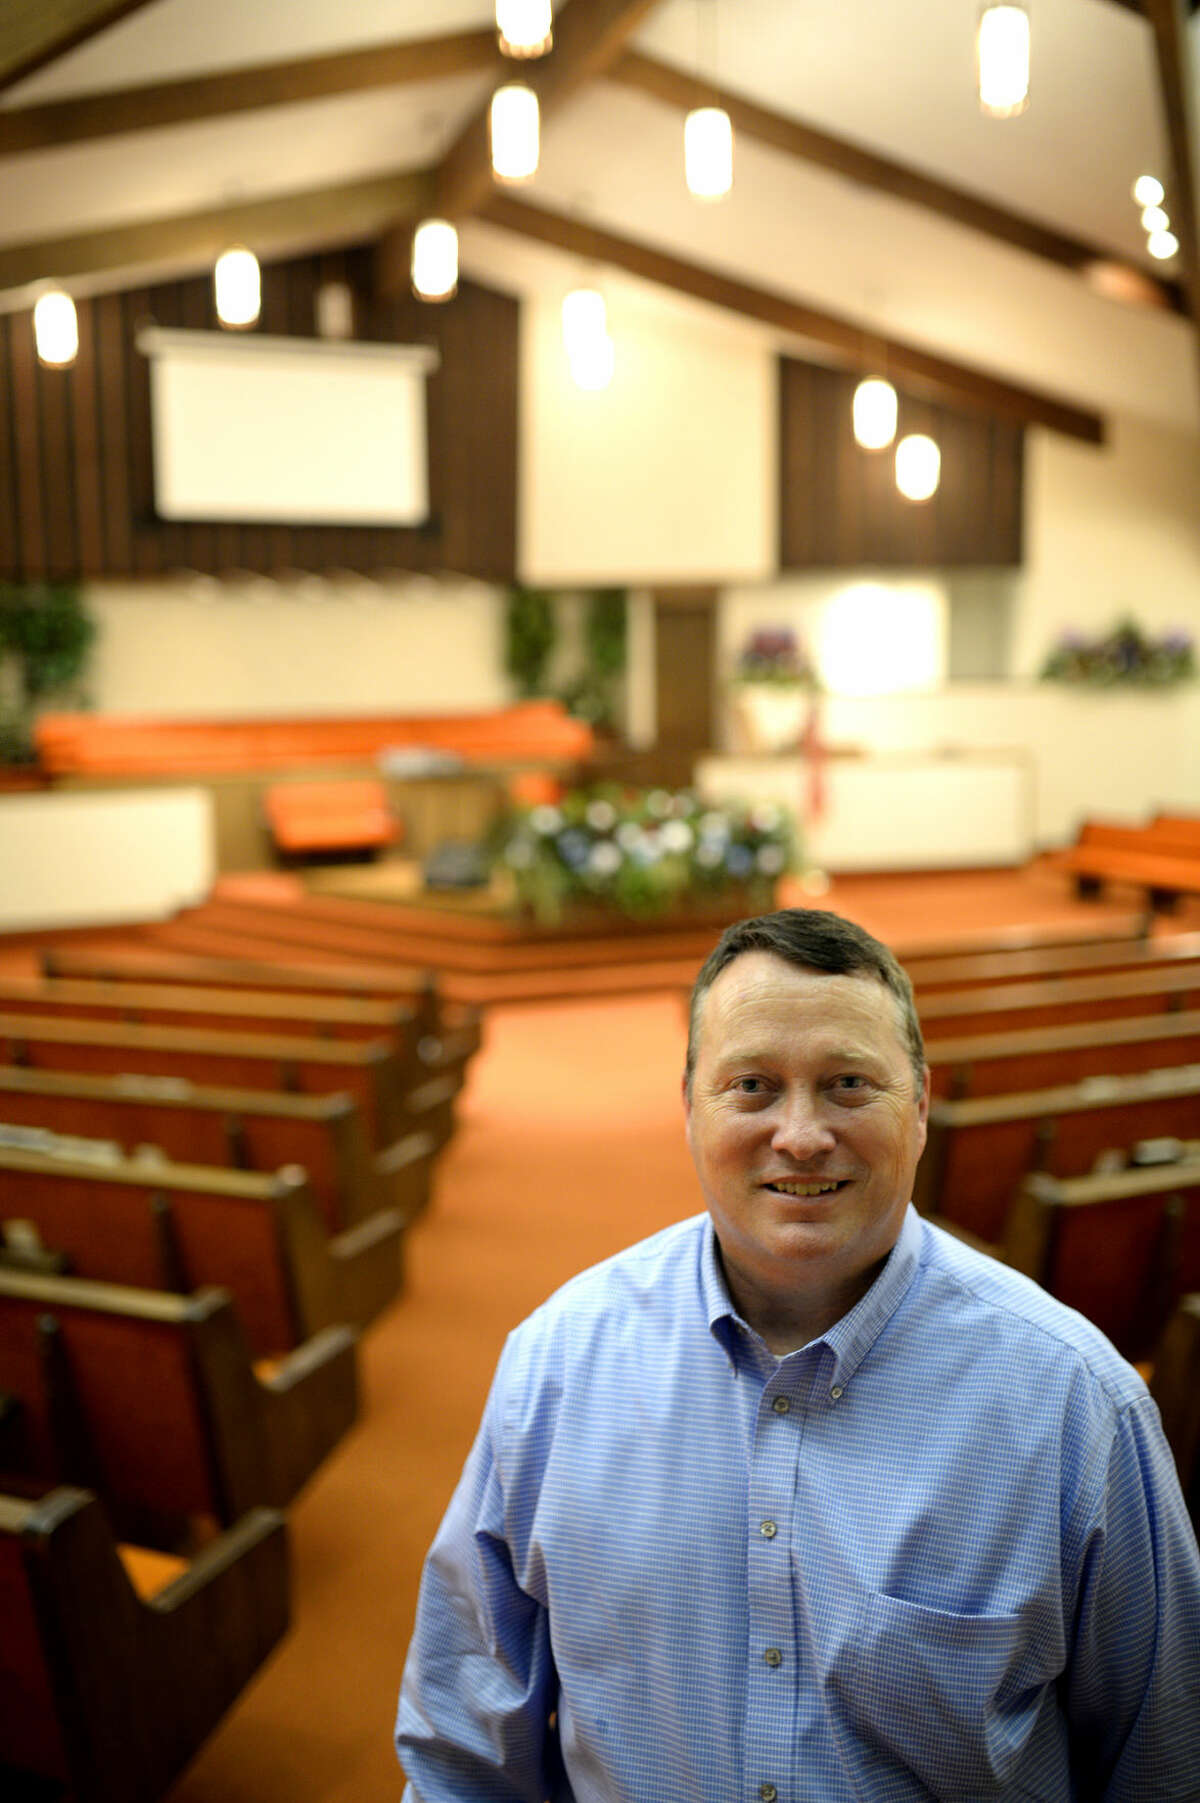 Robert Murphy is the new pastor at Alamo Heights Baptist Church, James Durbin/Reporter-Telegram